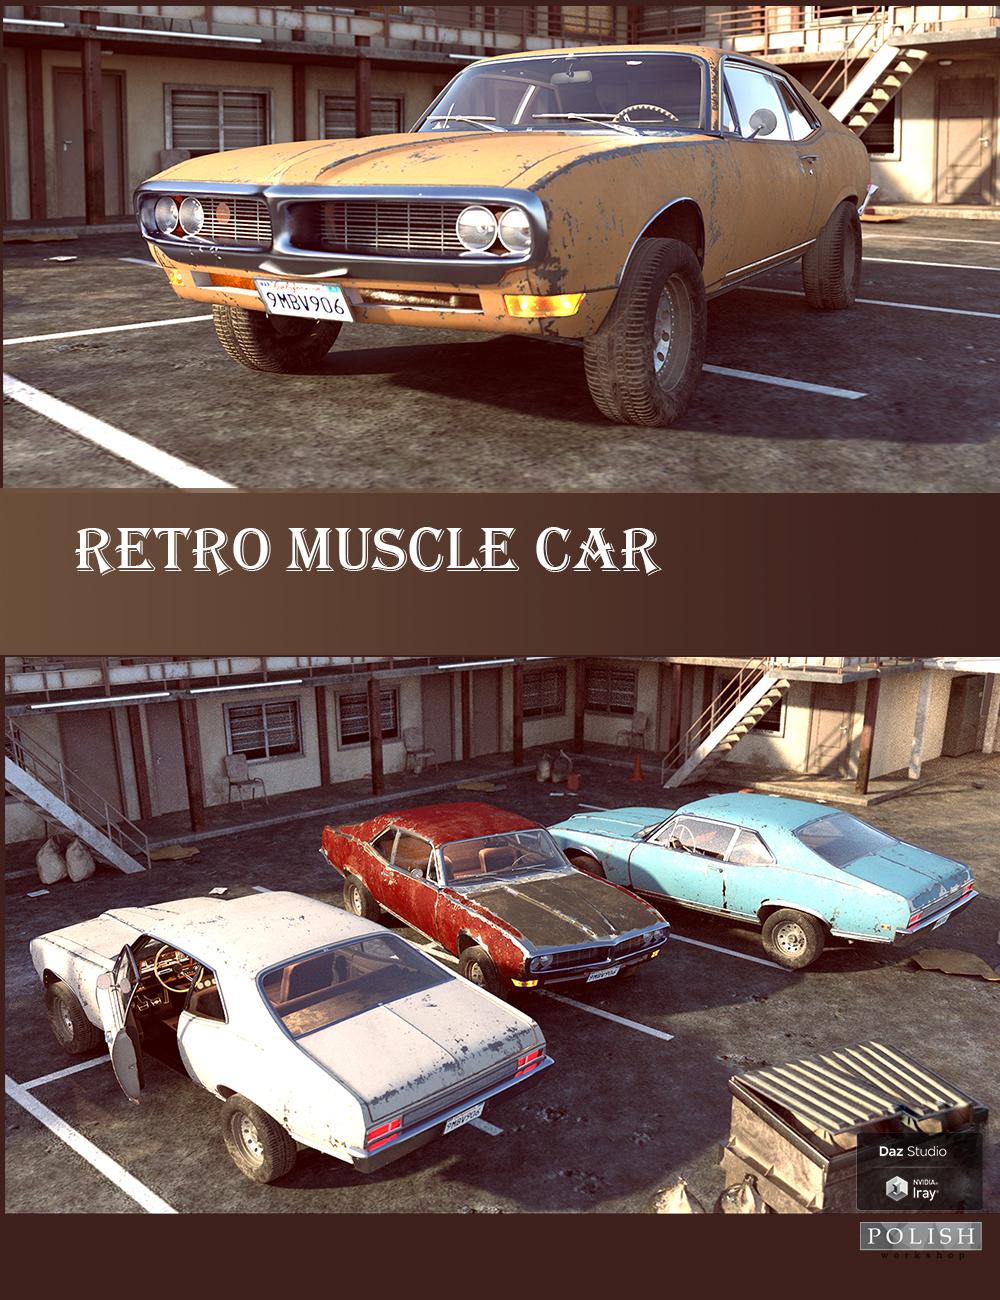 Retro Muscle Car by: Polish, 3D Models by Daz 3D